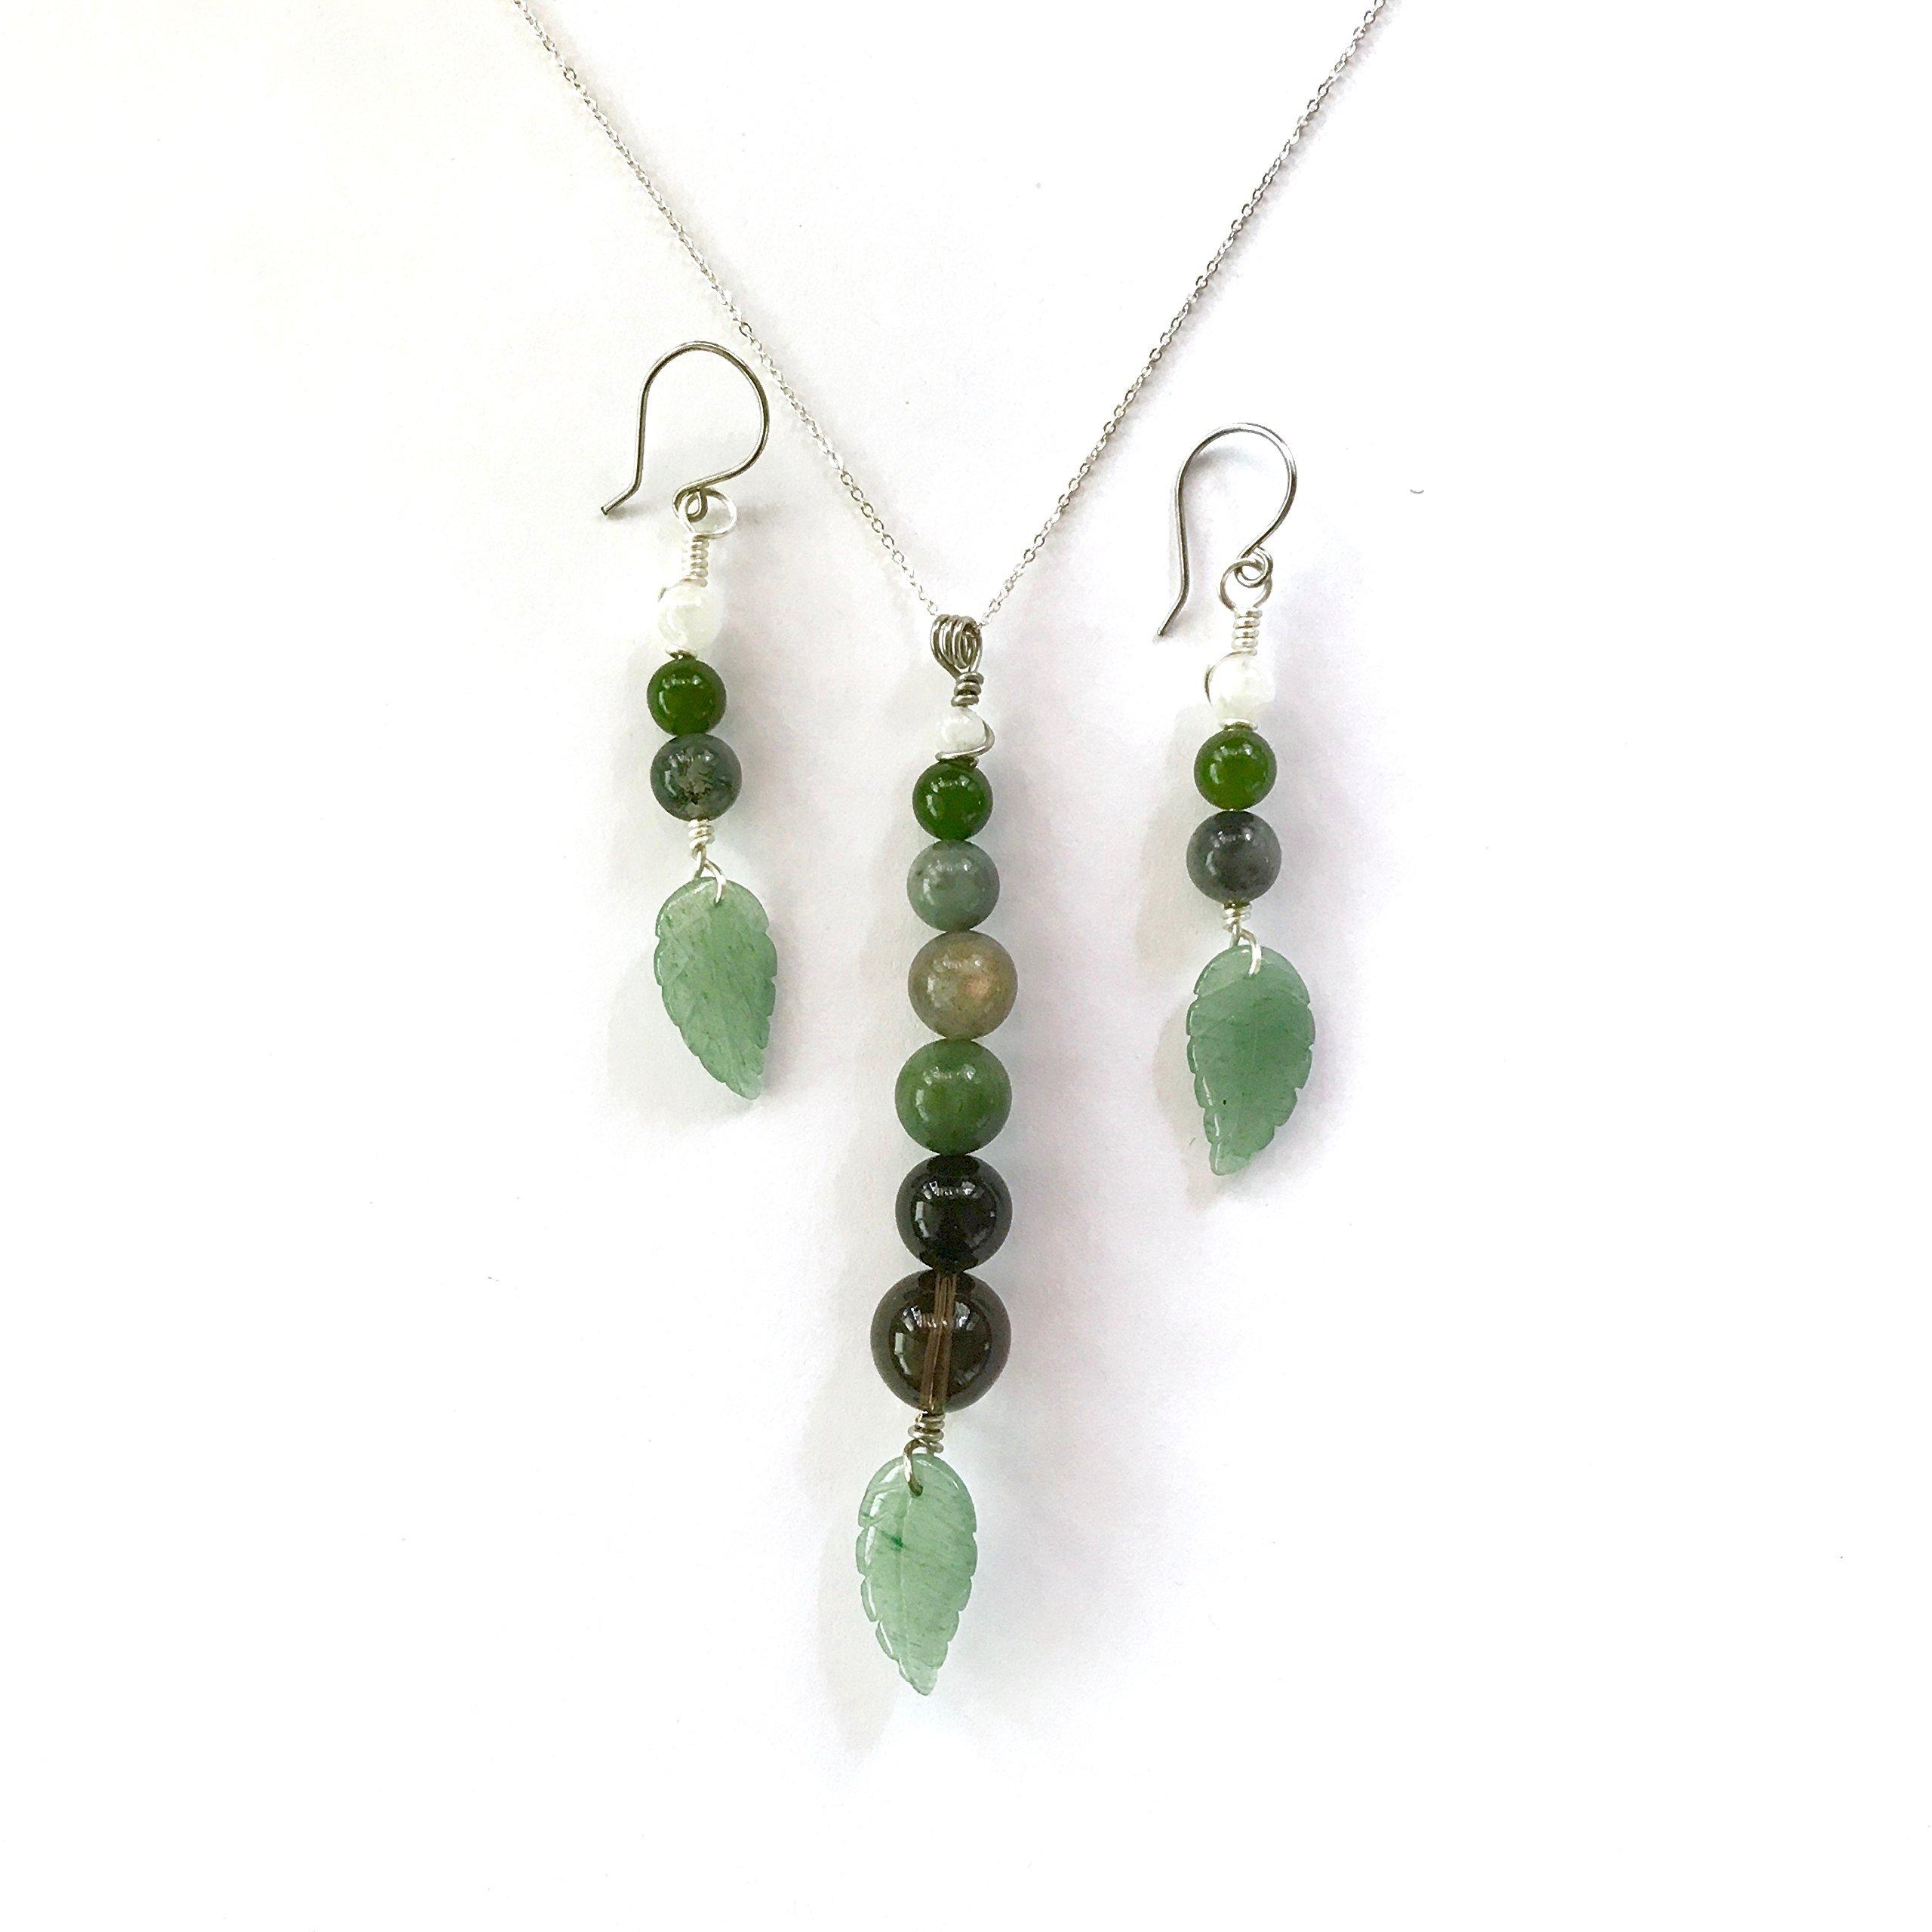 Aventurine Leaf Gemstone Drop Pendant Necklace & Earring Set